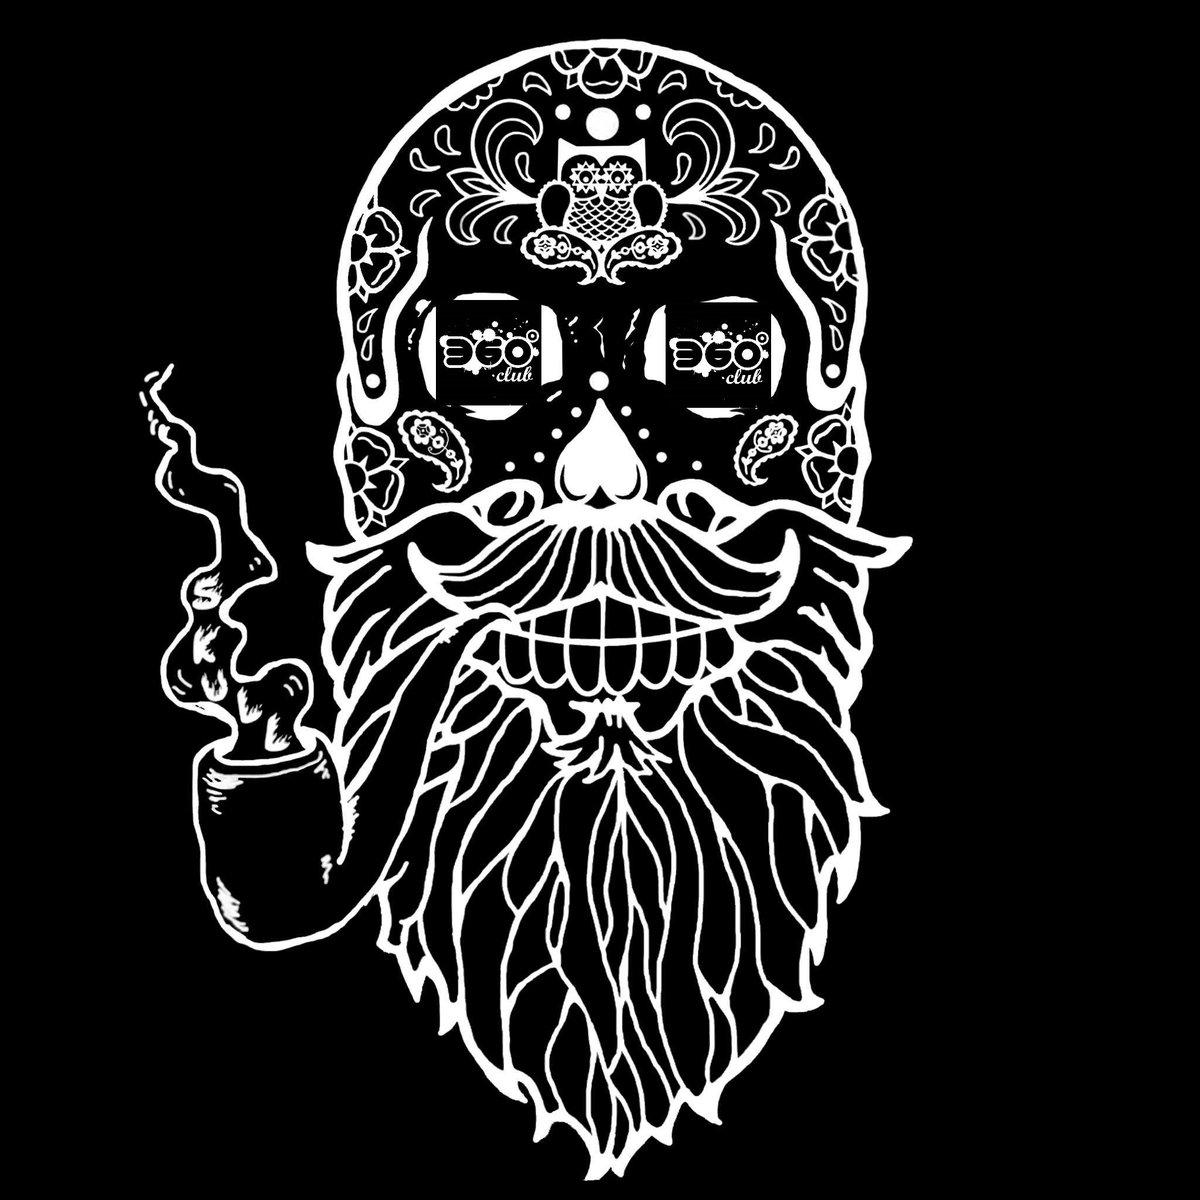 6th Oct announced @SKULLtheband Single Launch Tix @JumboRecords @Crash_Records  http://www. facebook.com/events/1967147 520231448 &nbsp; …  #Leeds #gigs #alternativerock #grunge<br>http://pic.twitter.com/neajh5VBtj